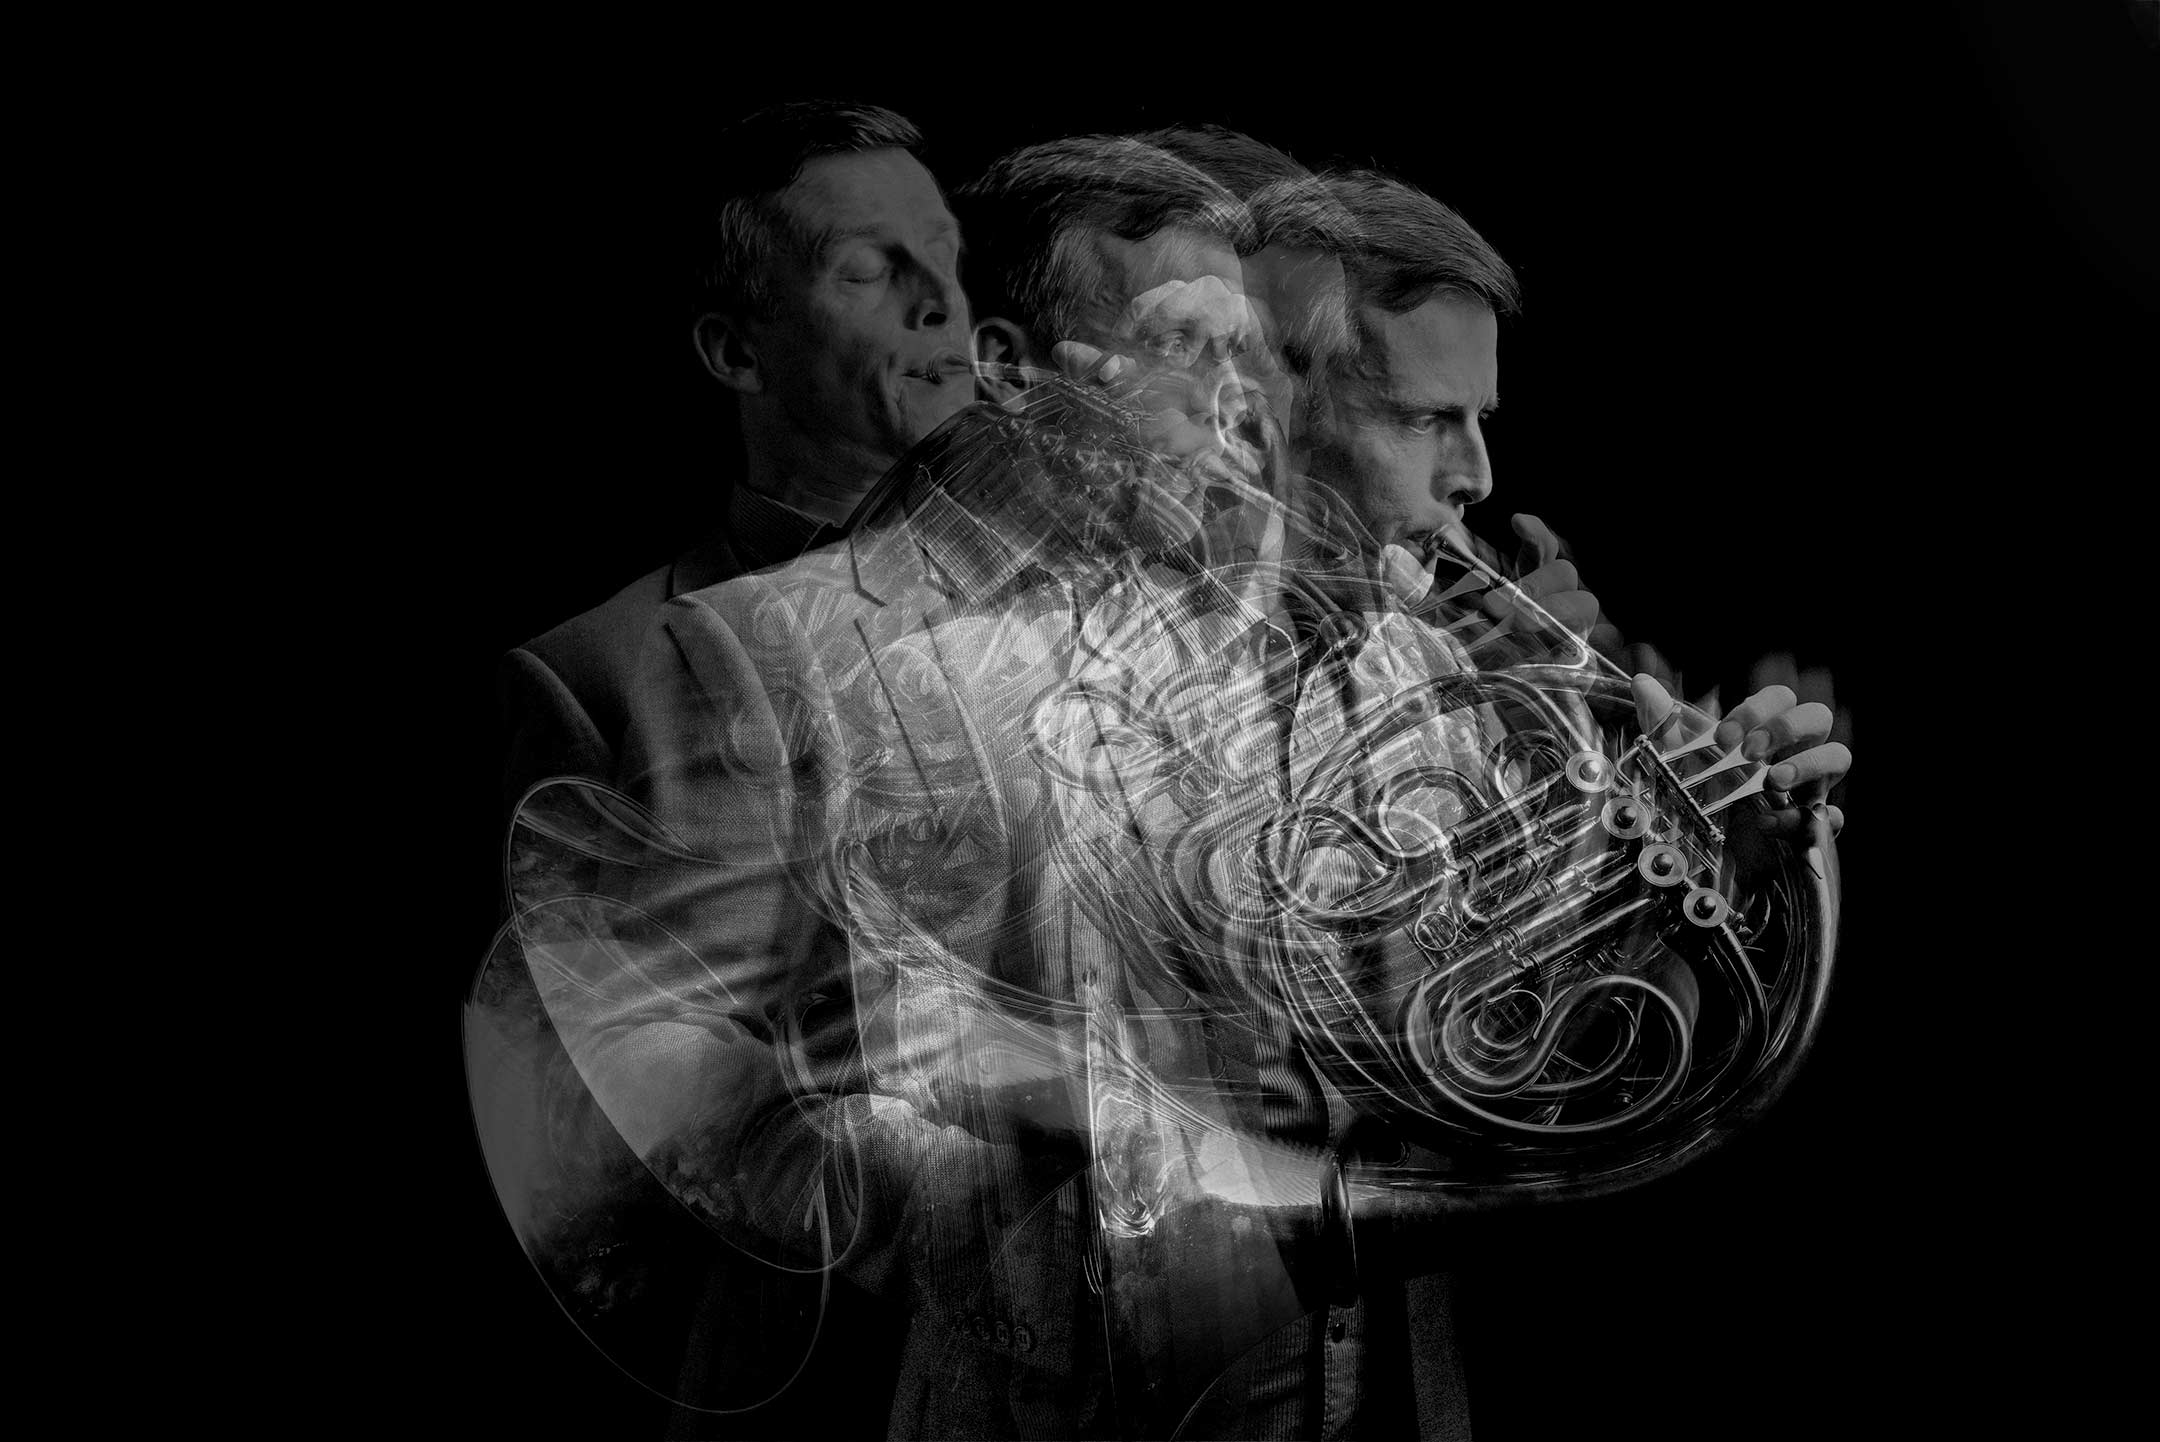 french_horn_musician_melbourne_symphony_saul_lewis_brandon_patoc.jpg